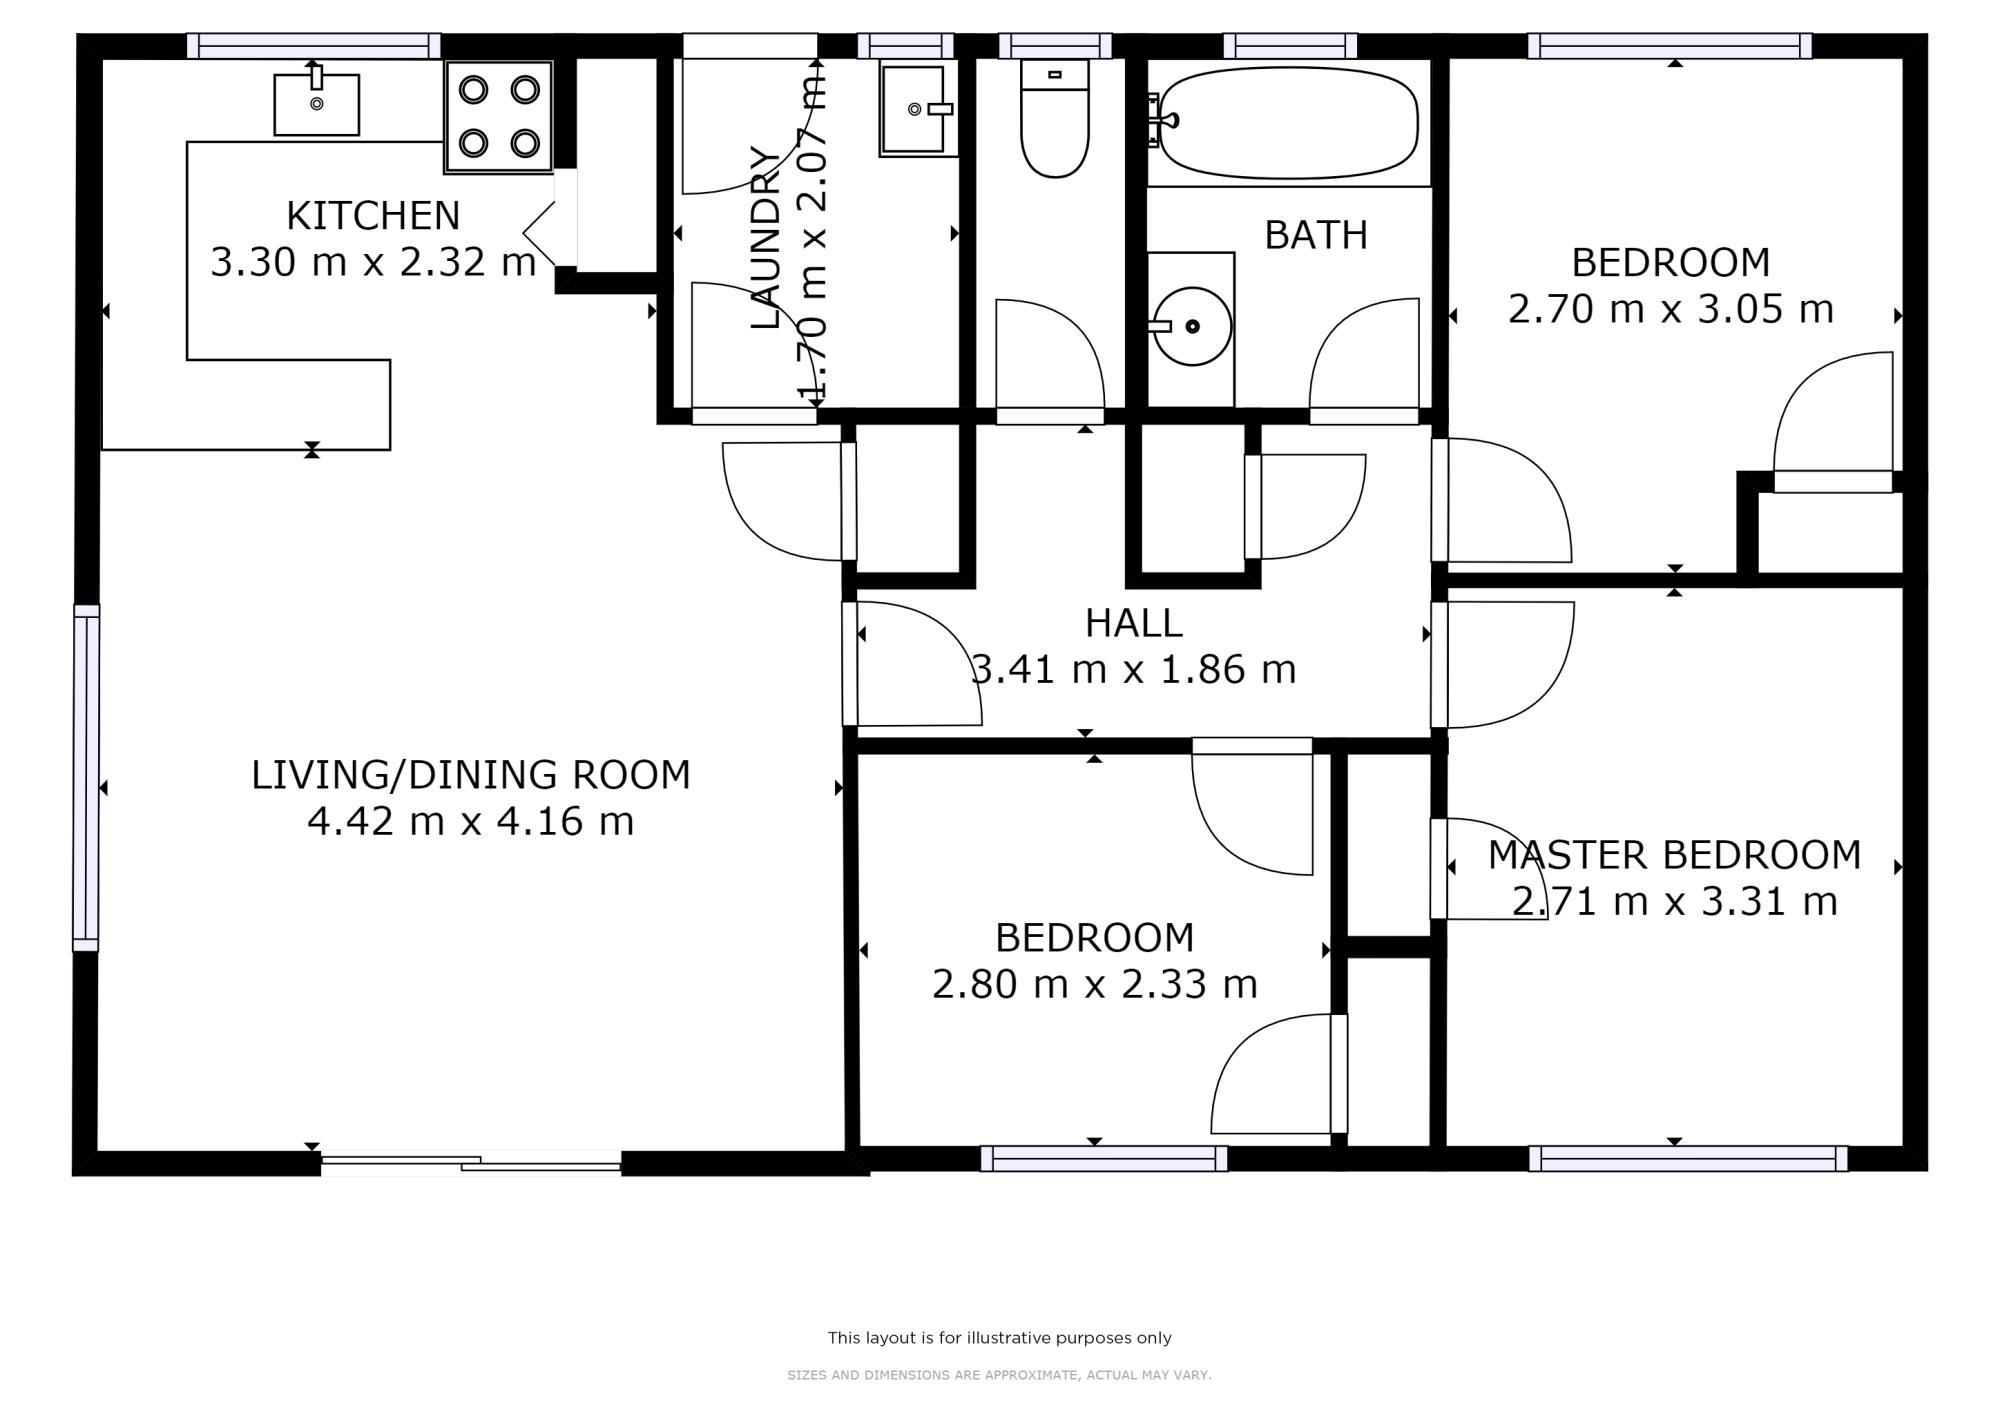 88A Tarewa Road Morningsideproperty floorplan image